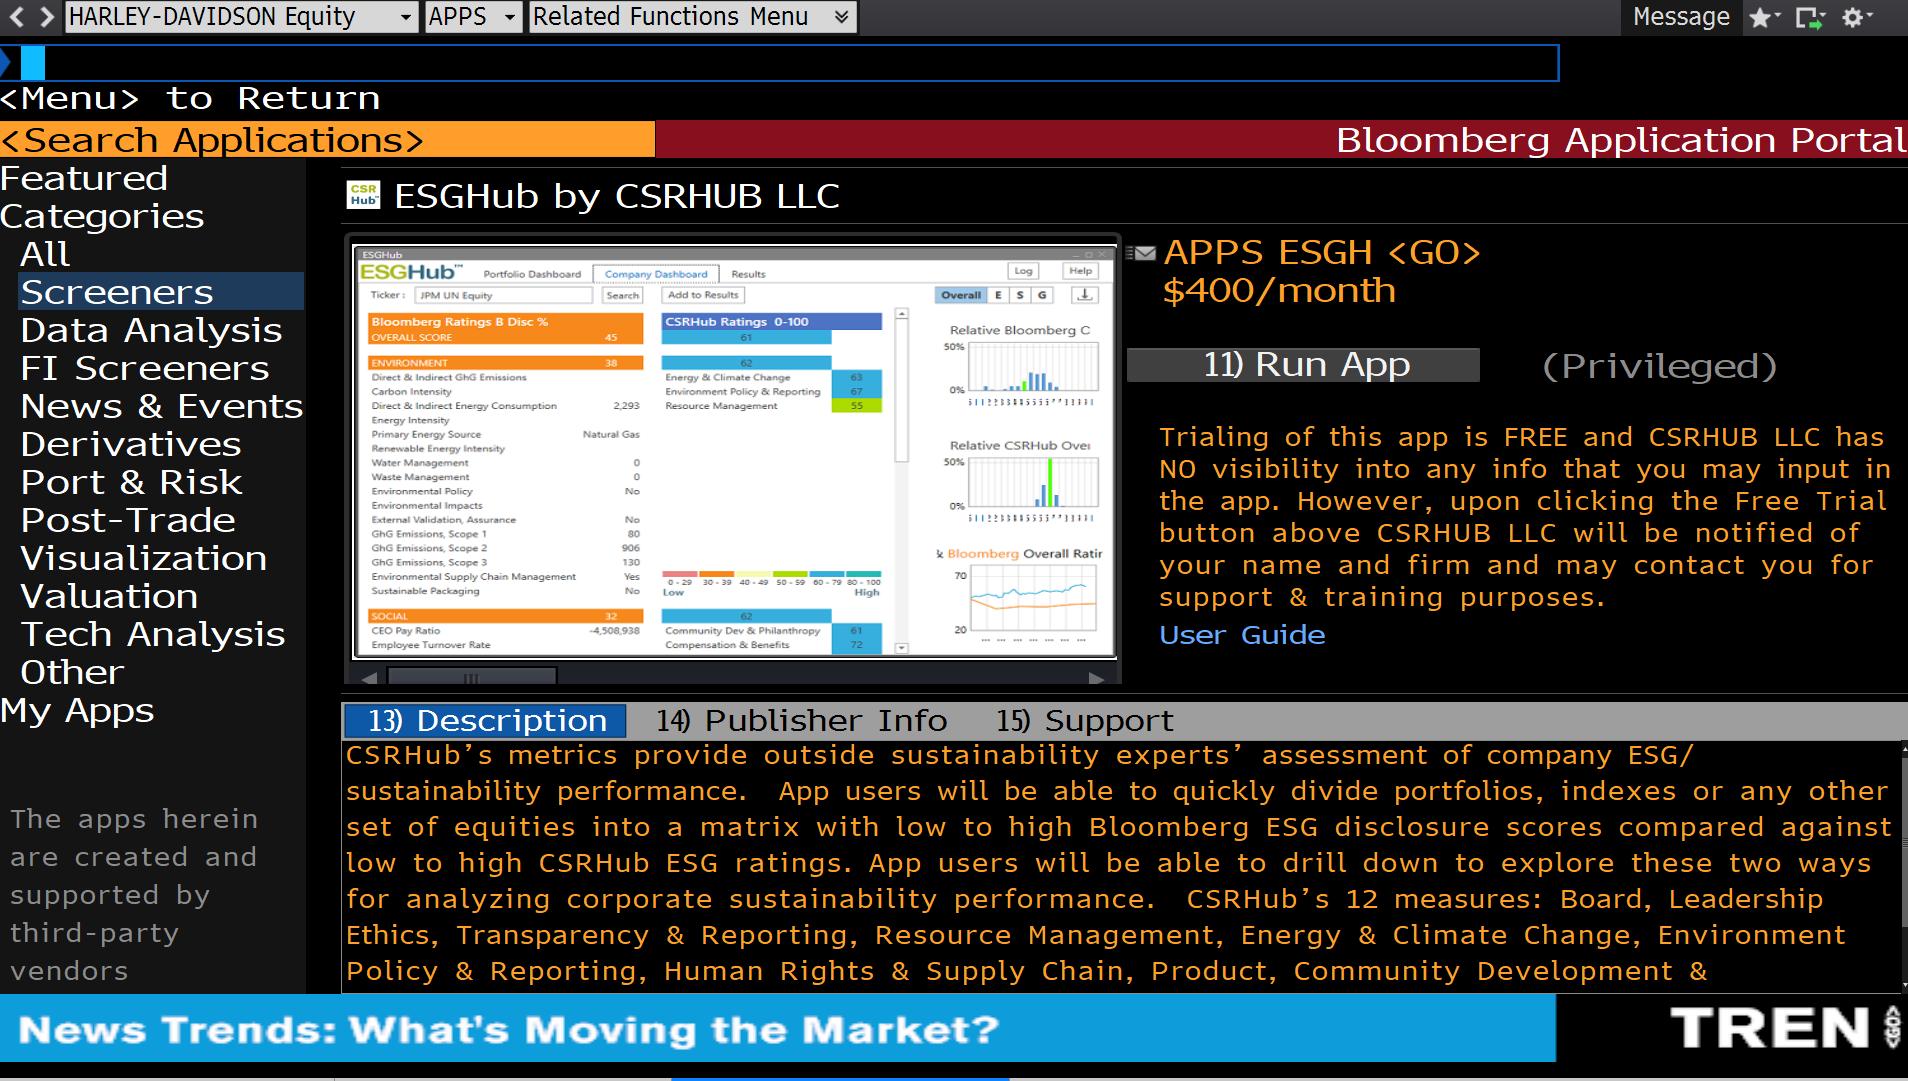 ESGHub by CSRHub LLC - A new App on the Bloomberg terminal